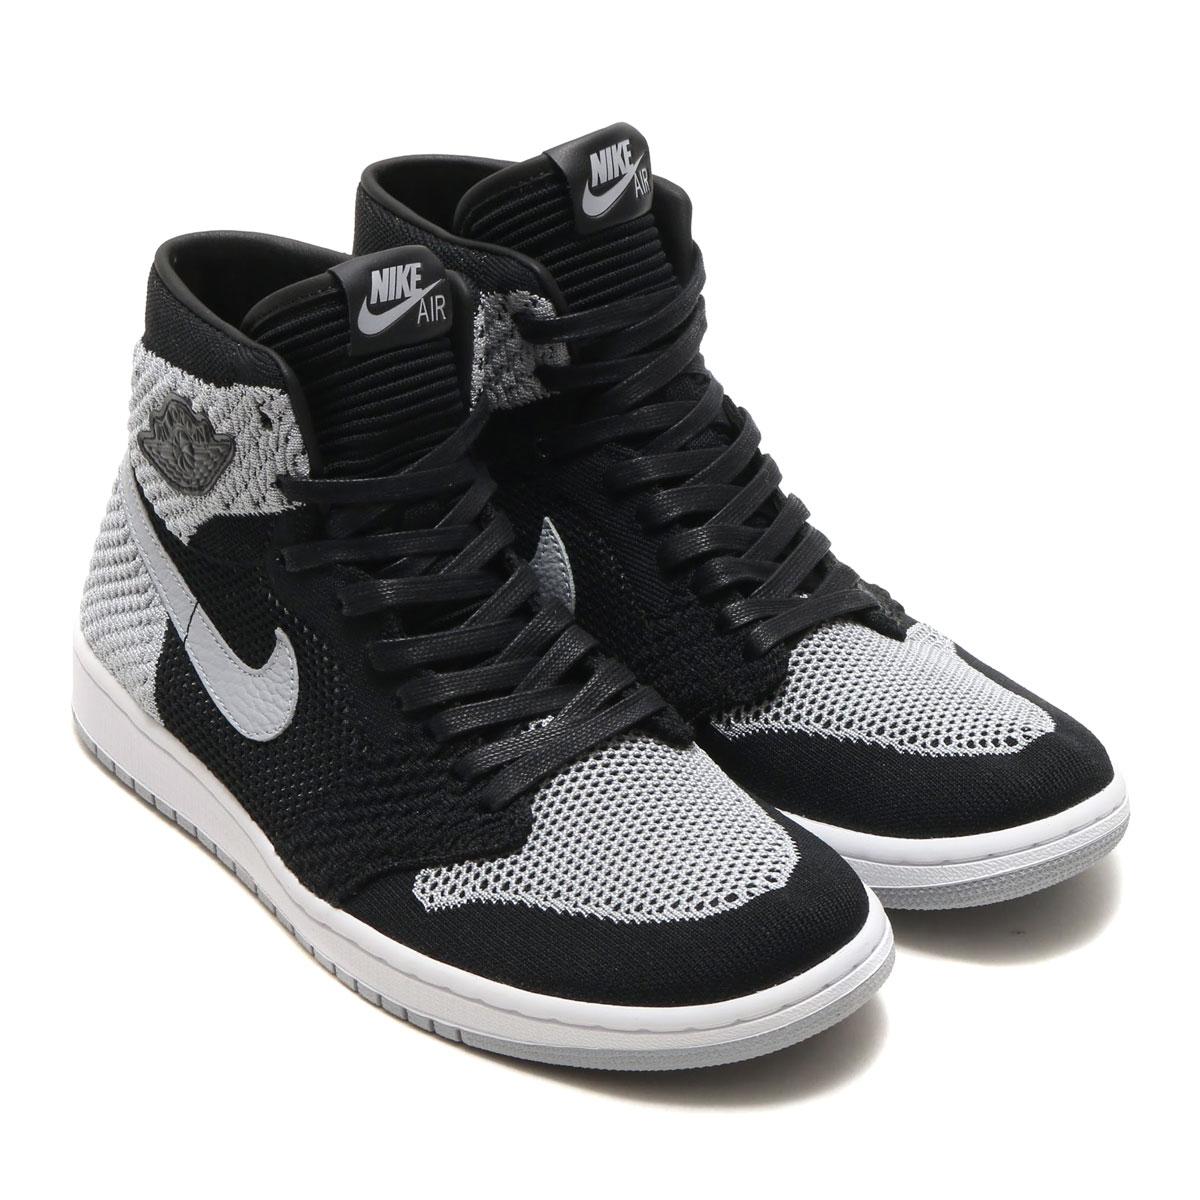 Nike Nostalgic Grey White18sp High Knitblackwolf Flyknitnike Jordan Air 1 Retro Hi Fried S Food POkXZwiTu